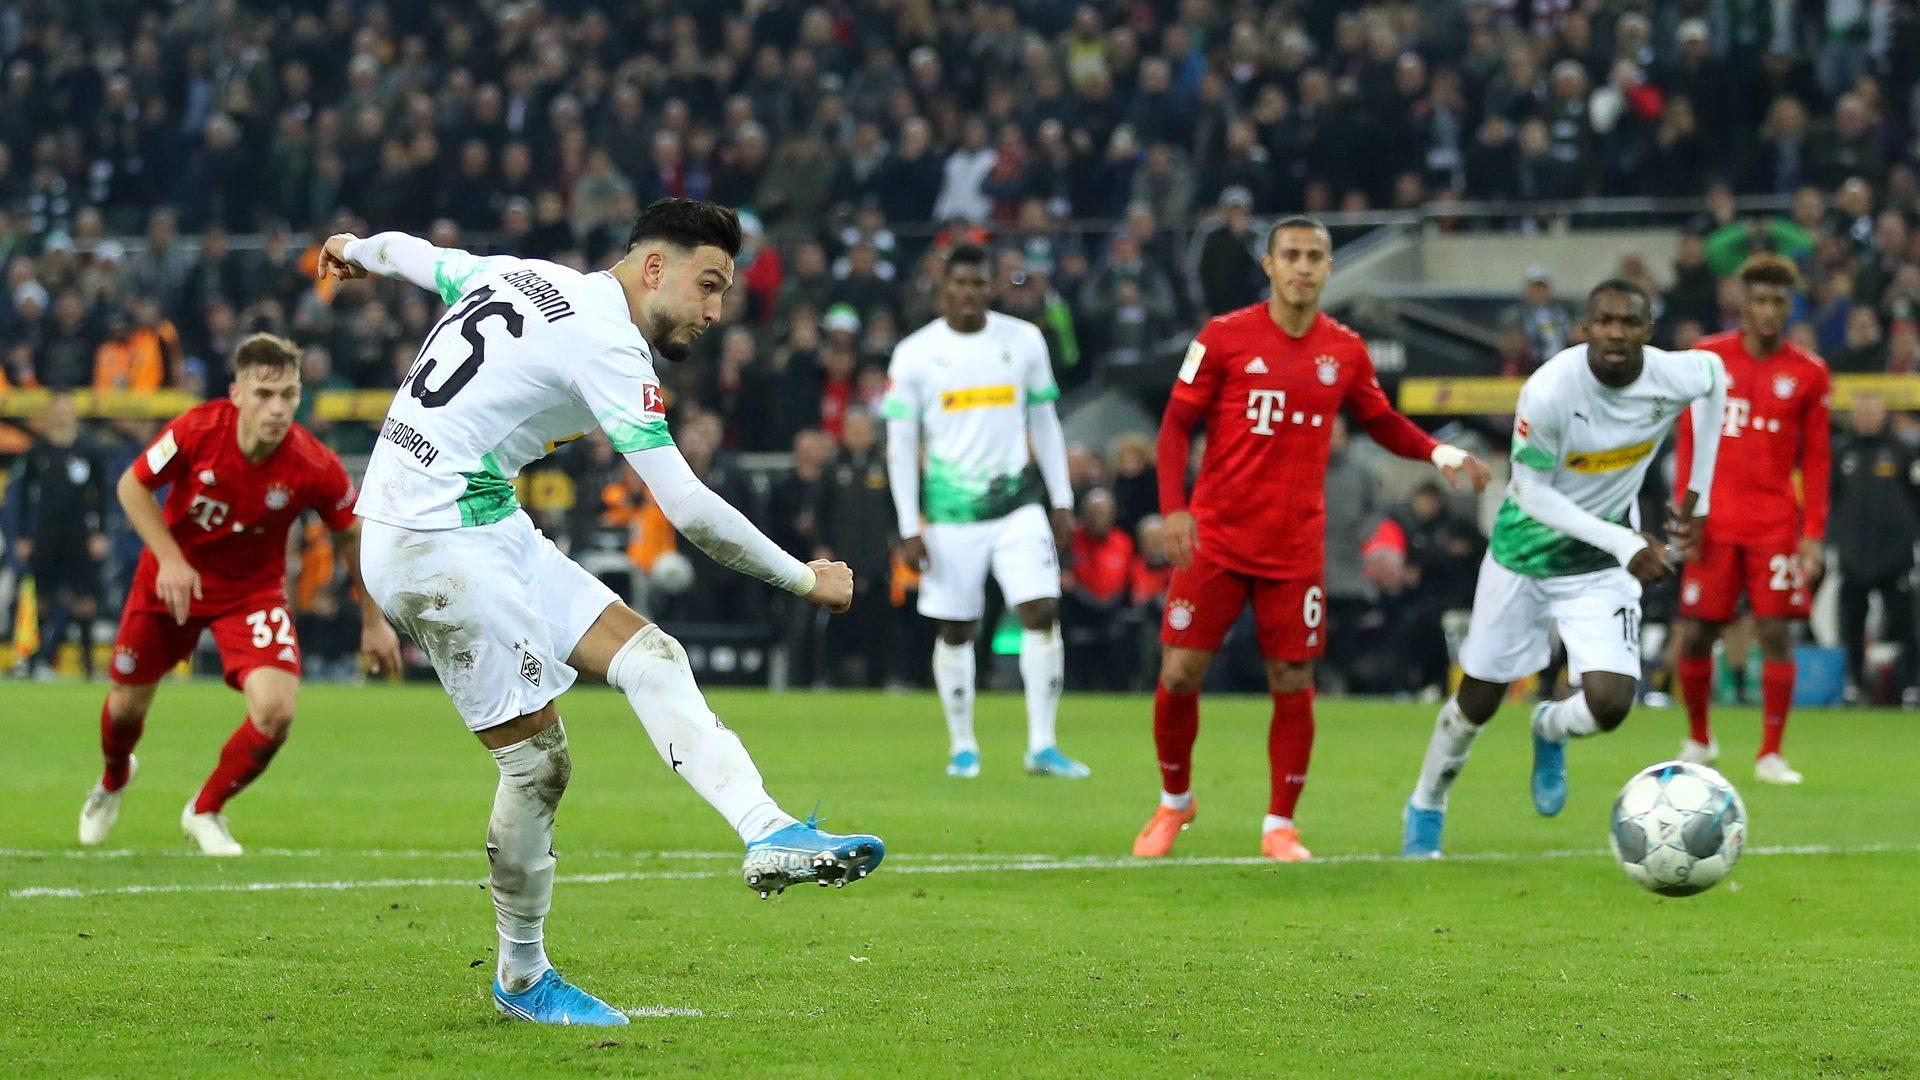 2:1-Sieg: Bensebaini schießt Fohlen gegen FCB ins Glück